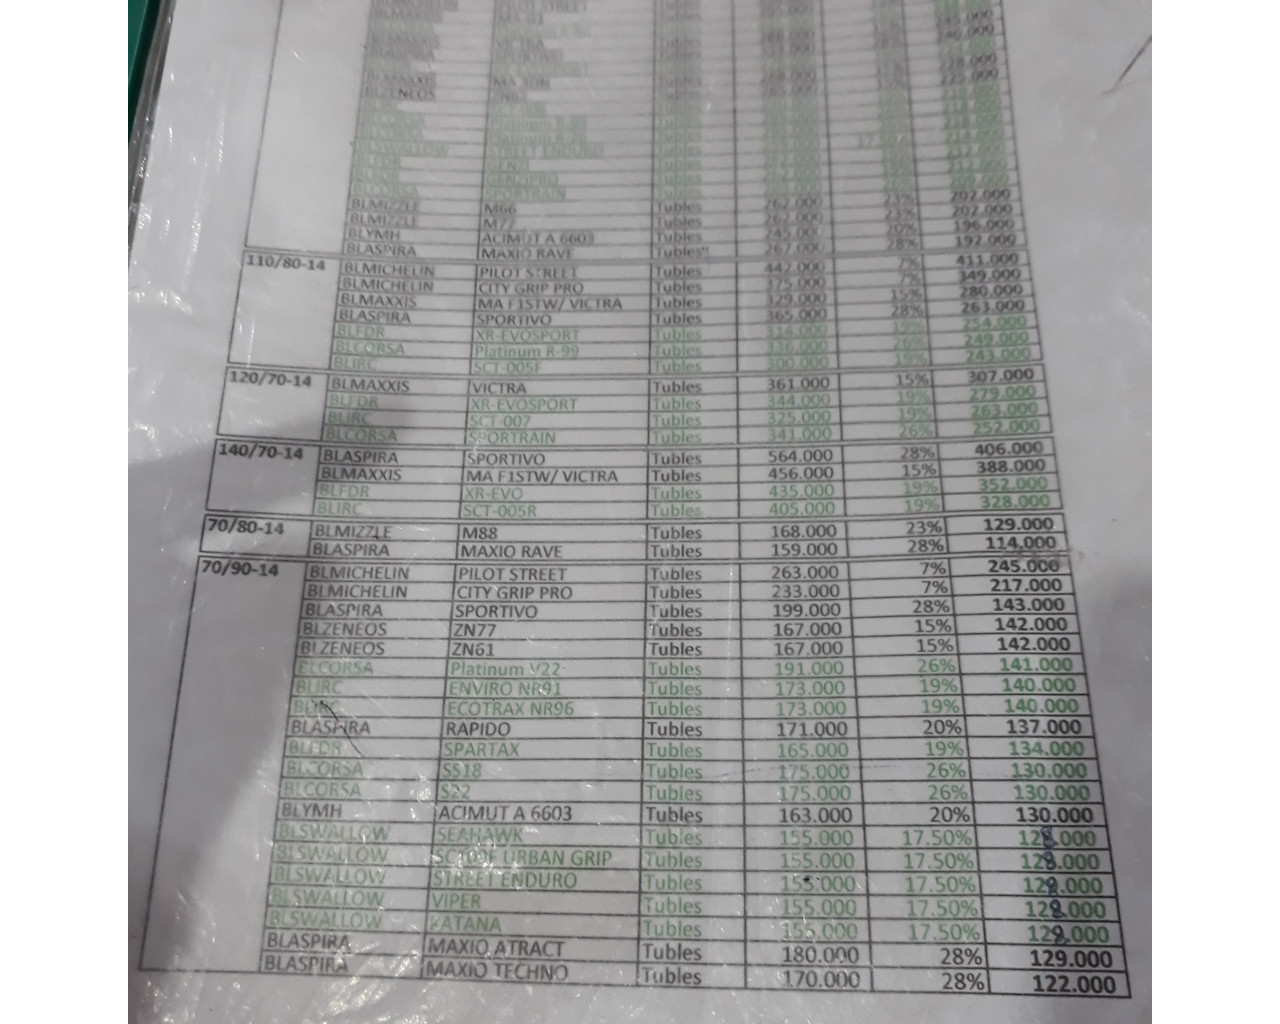 Daftar Harga DSM Motor 1